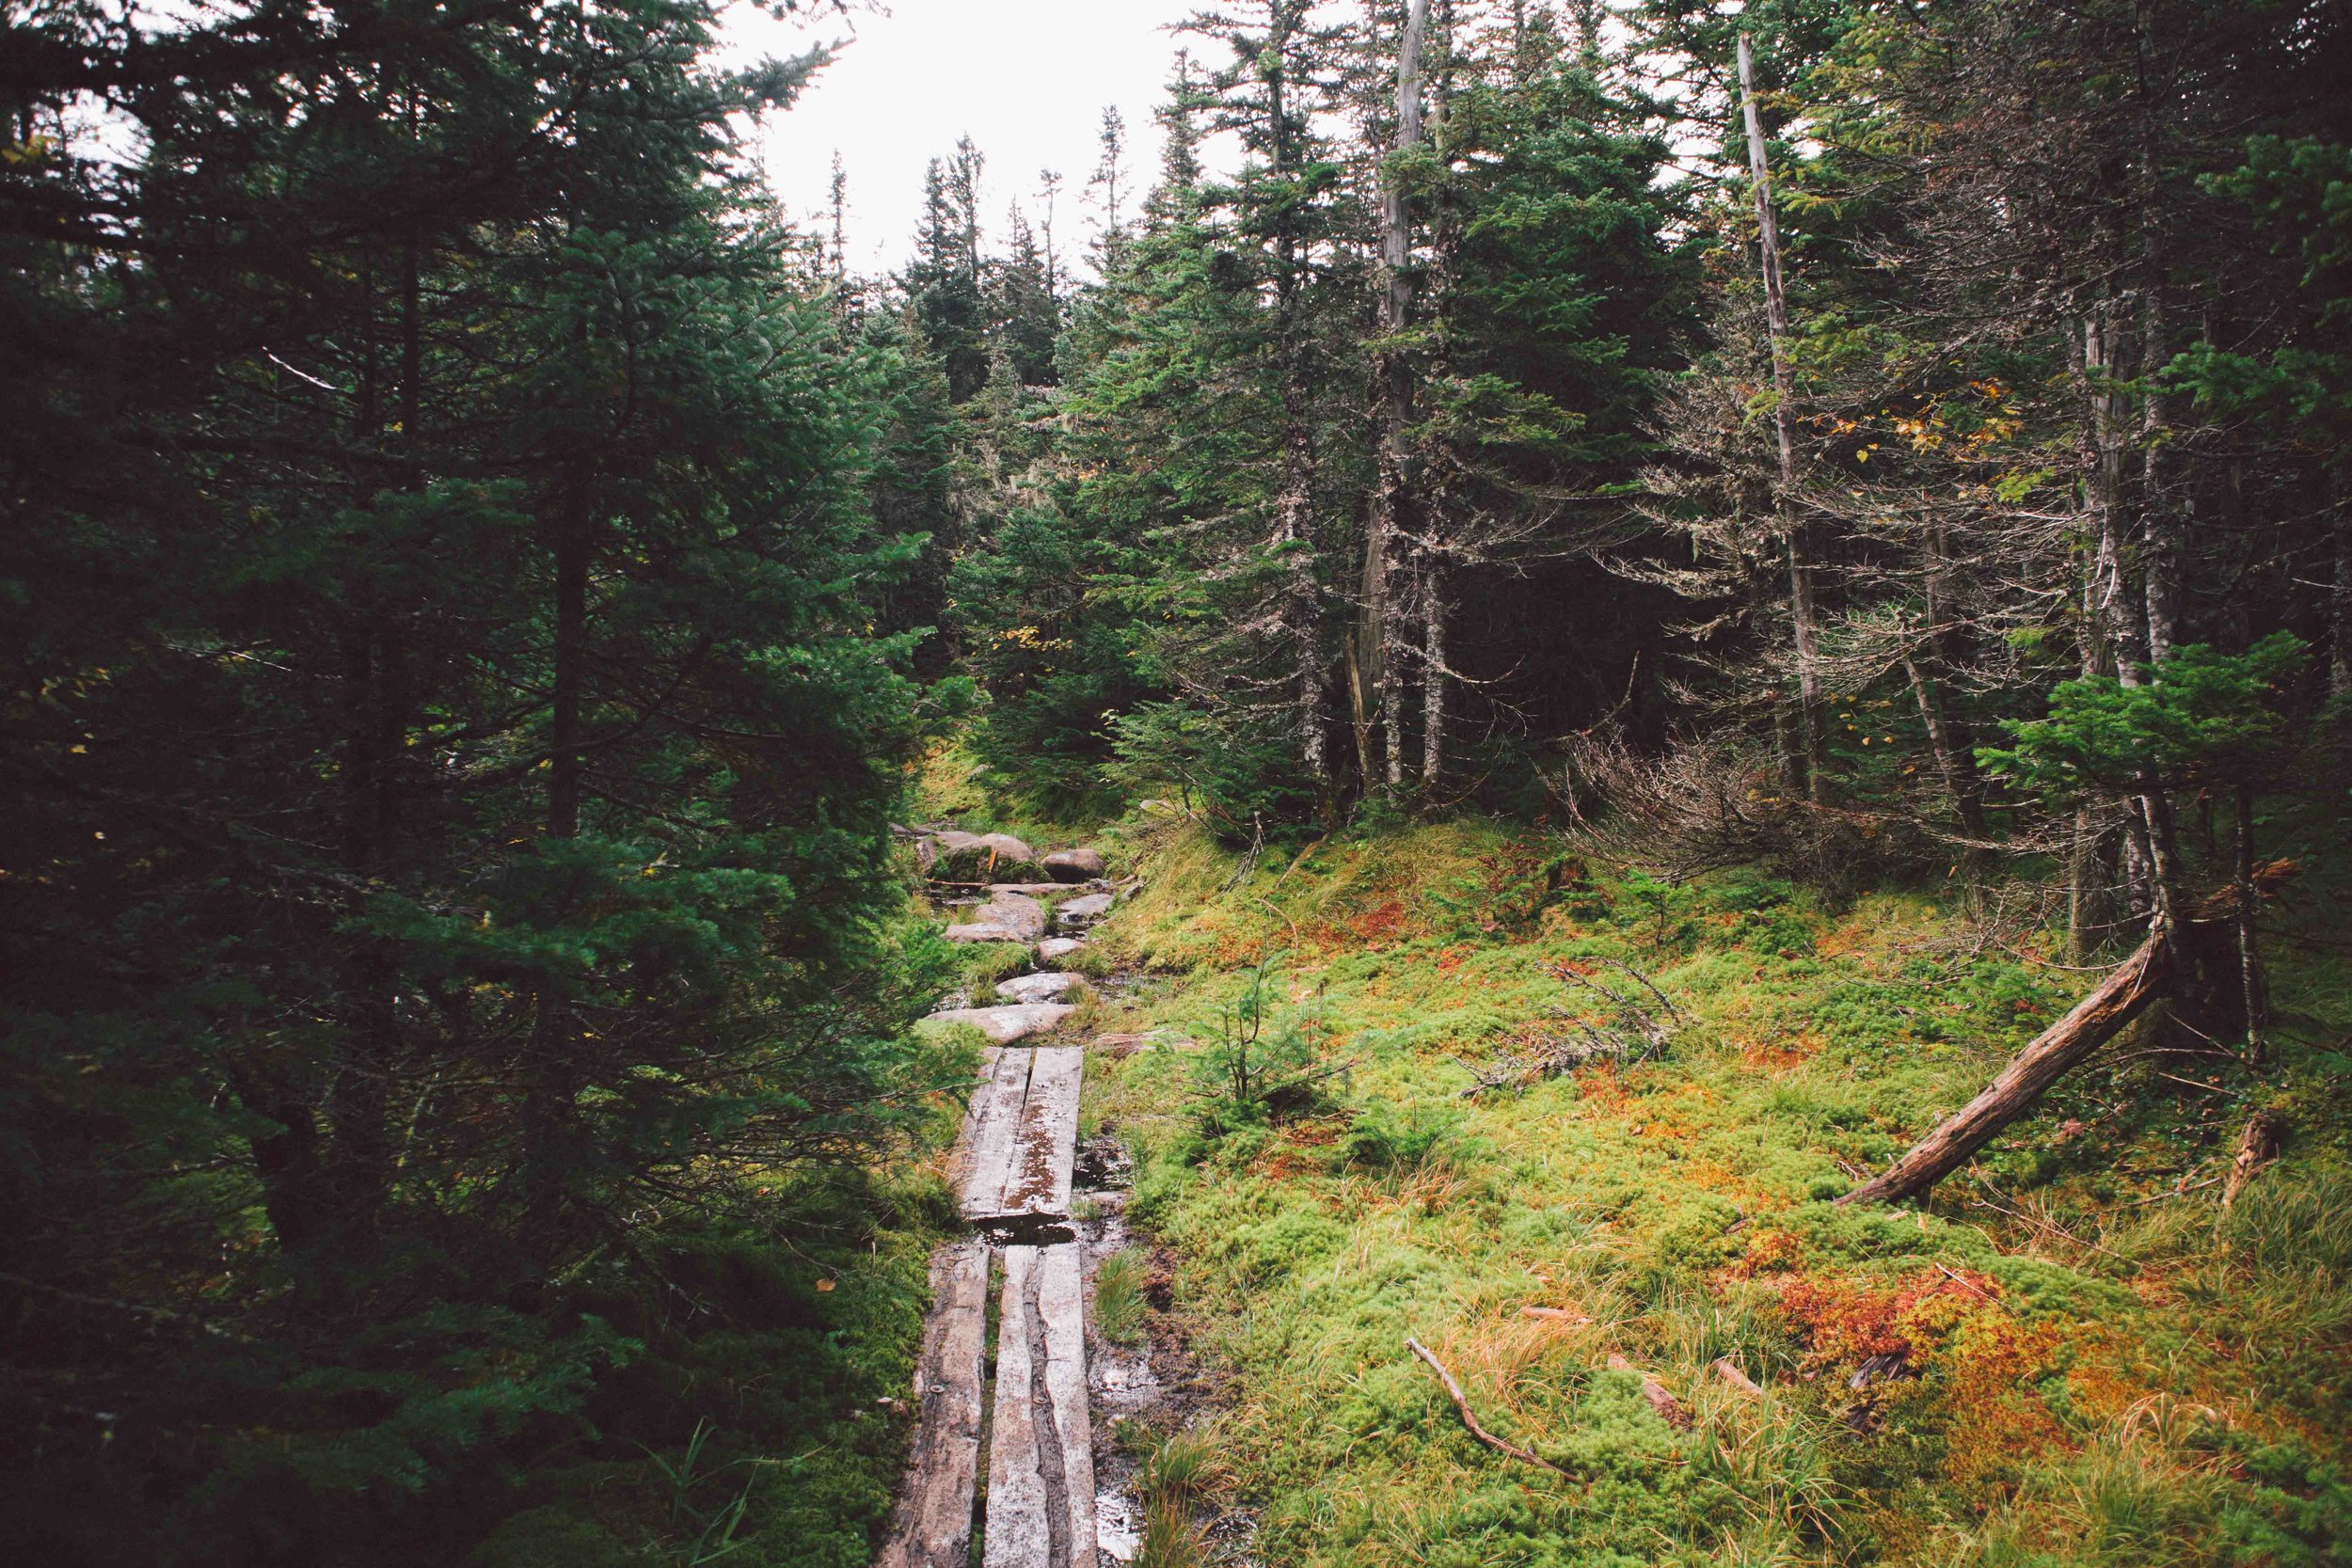 Adirondacks-2018-web-2-12-Mount-Marcy.jpg